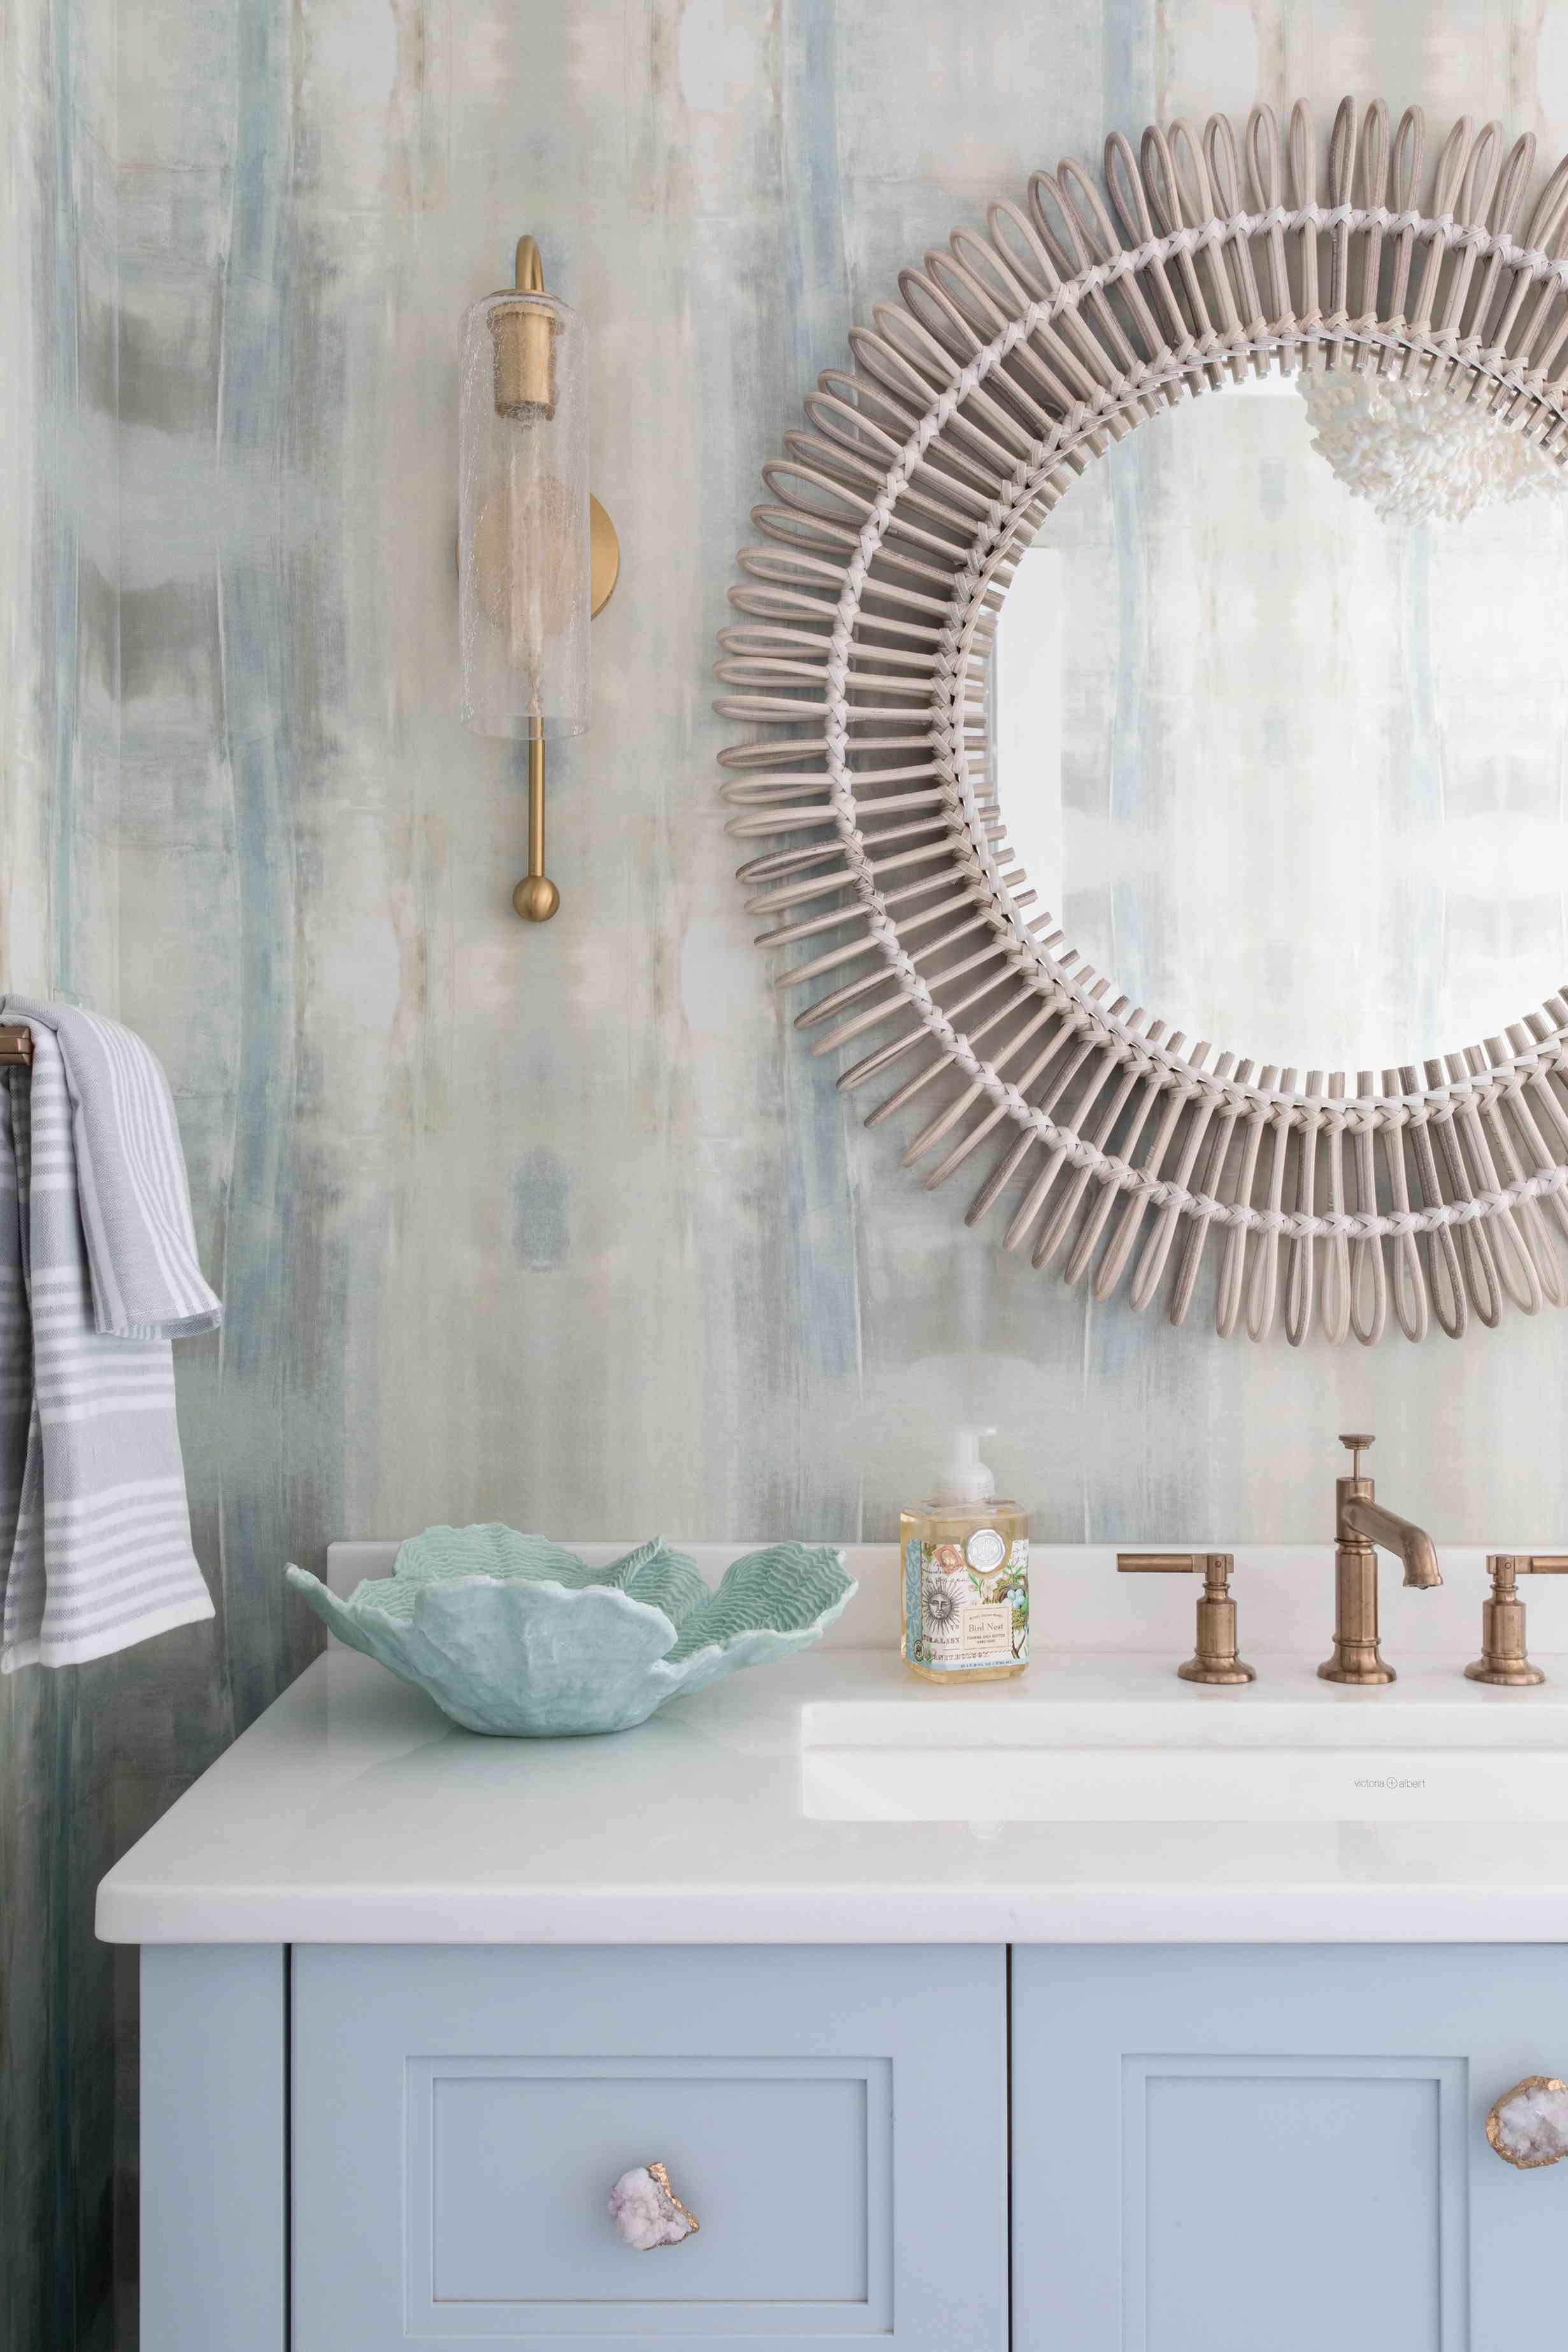 A bathroom in the Long Beach Island home of Karen B. Wolfe